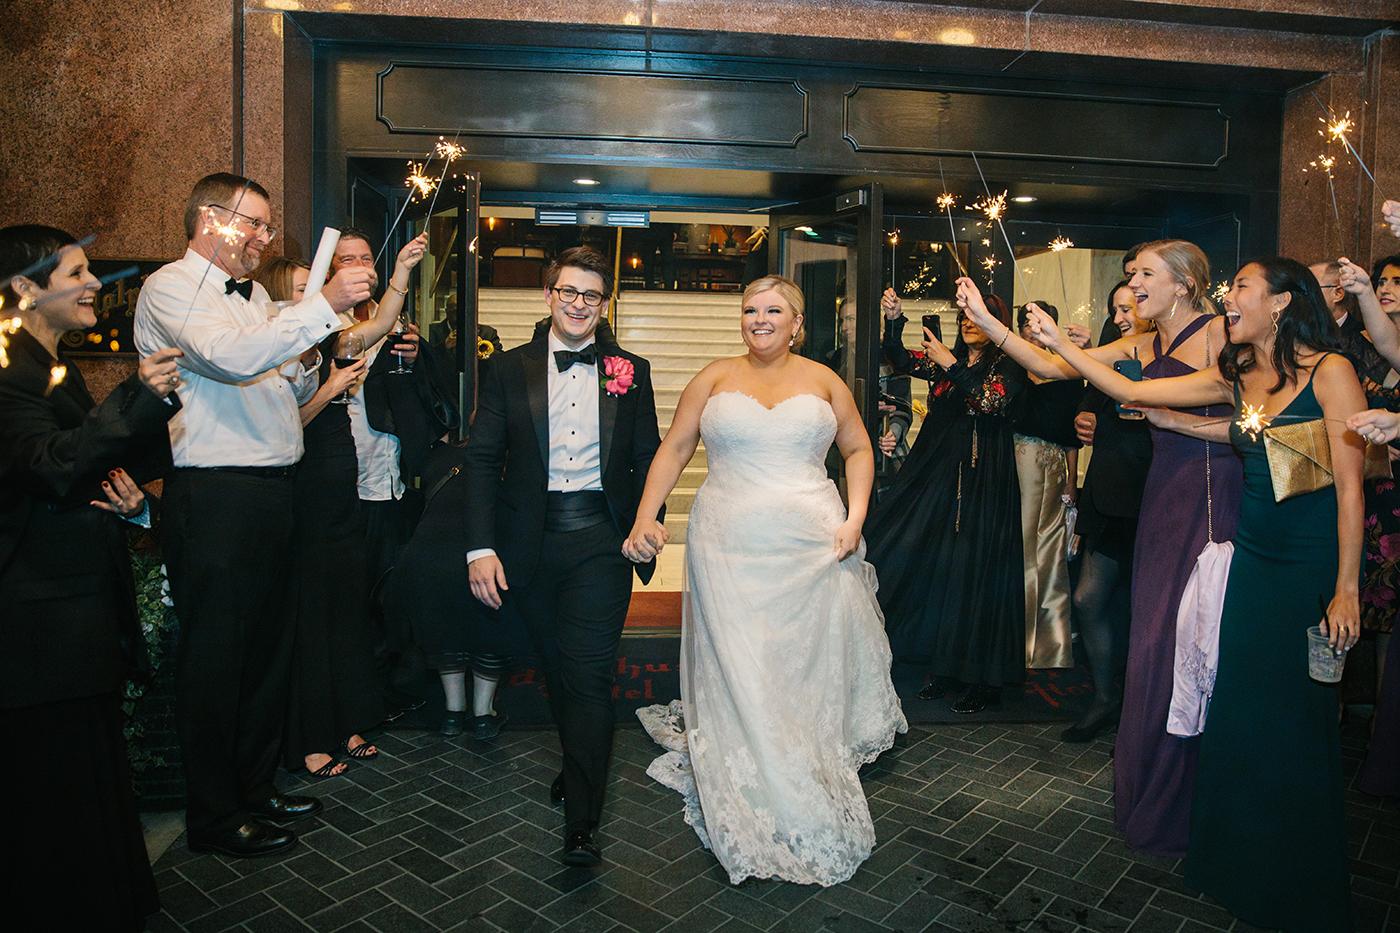 Dallas Weddings Planner - Allday Events - Katie + Matthew at The Adolphus Hotel - 721.jpg